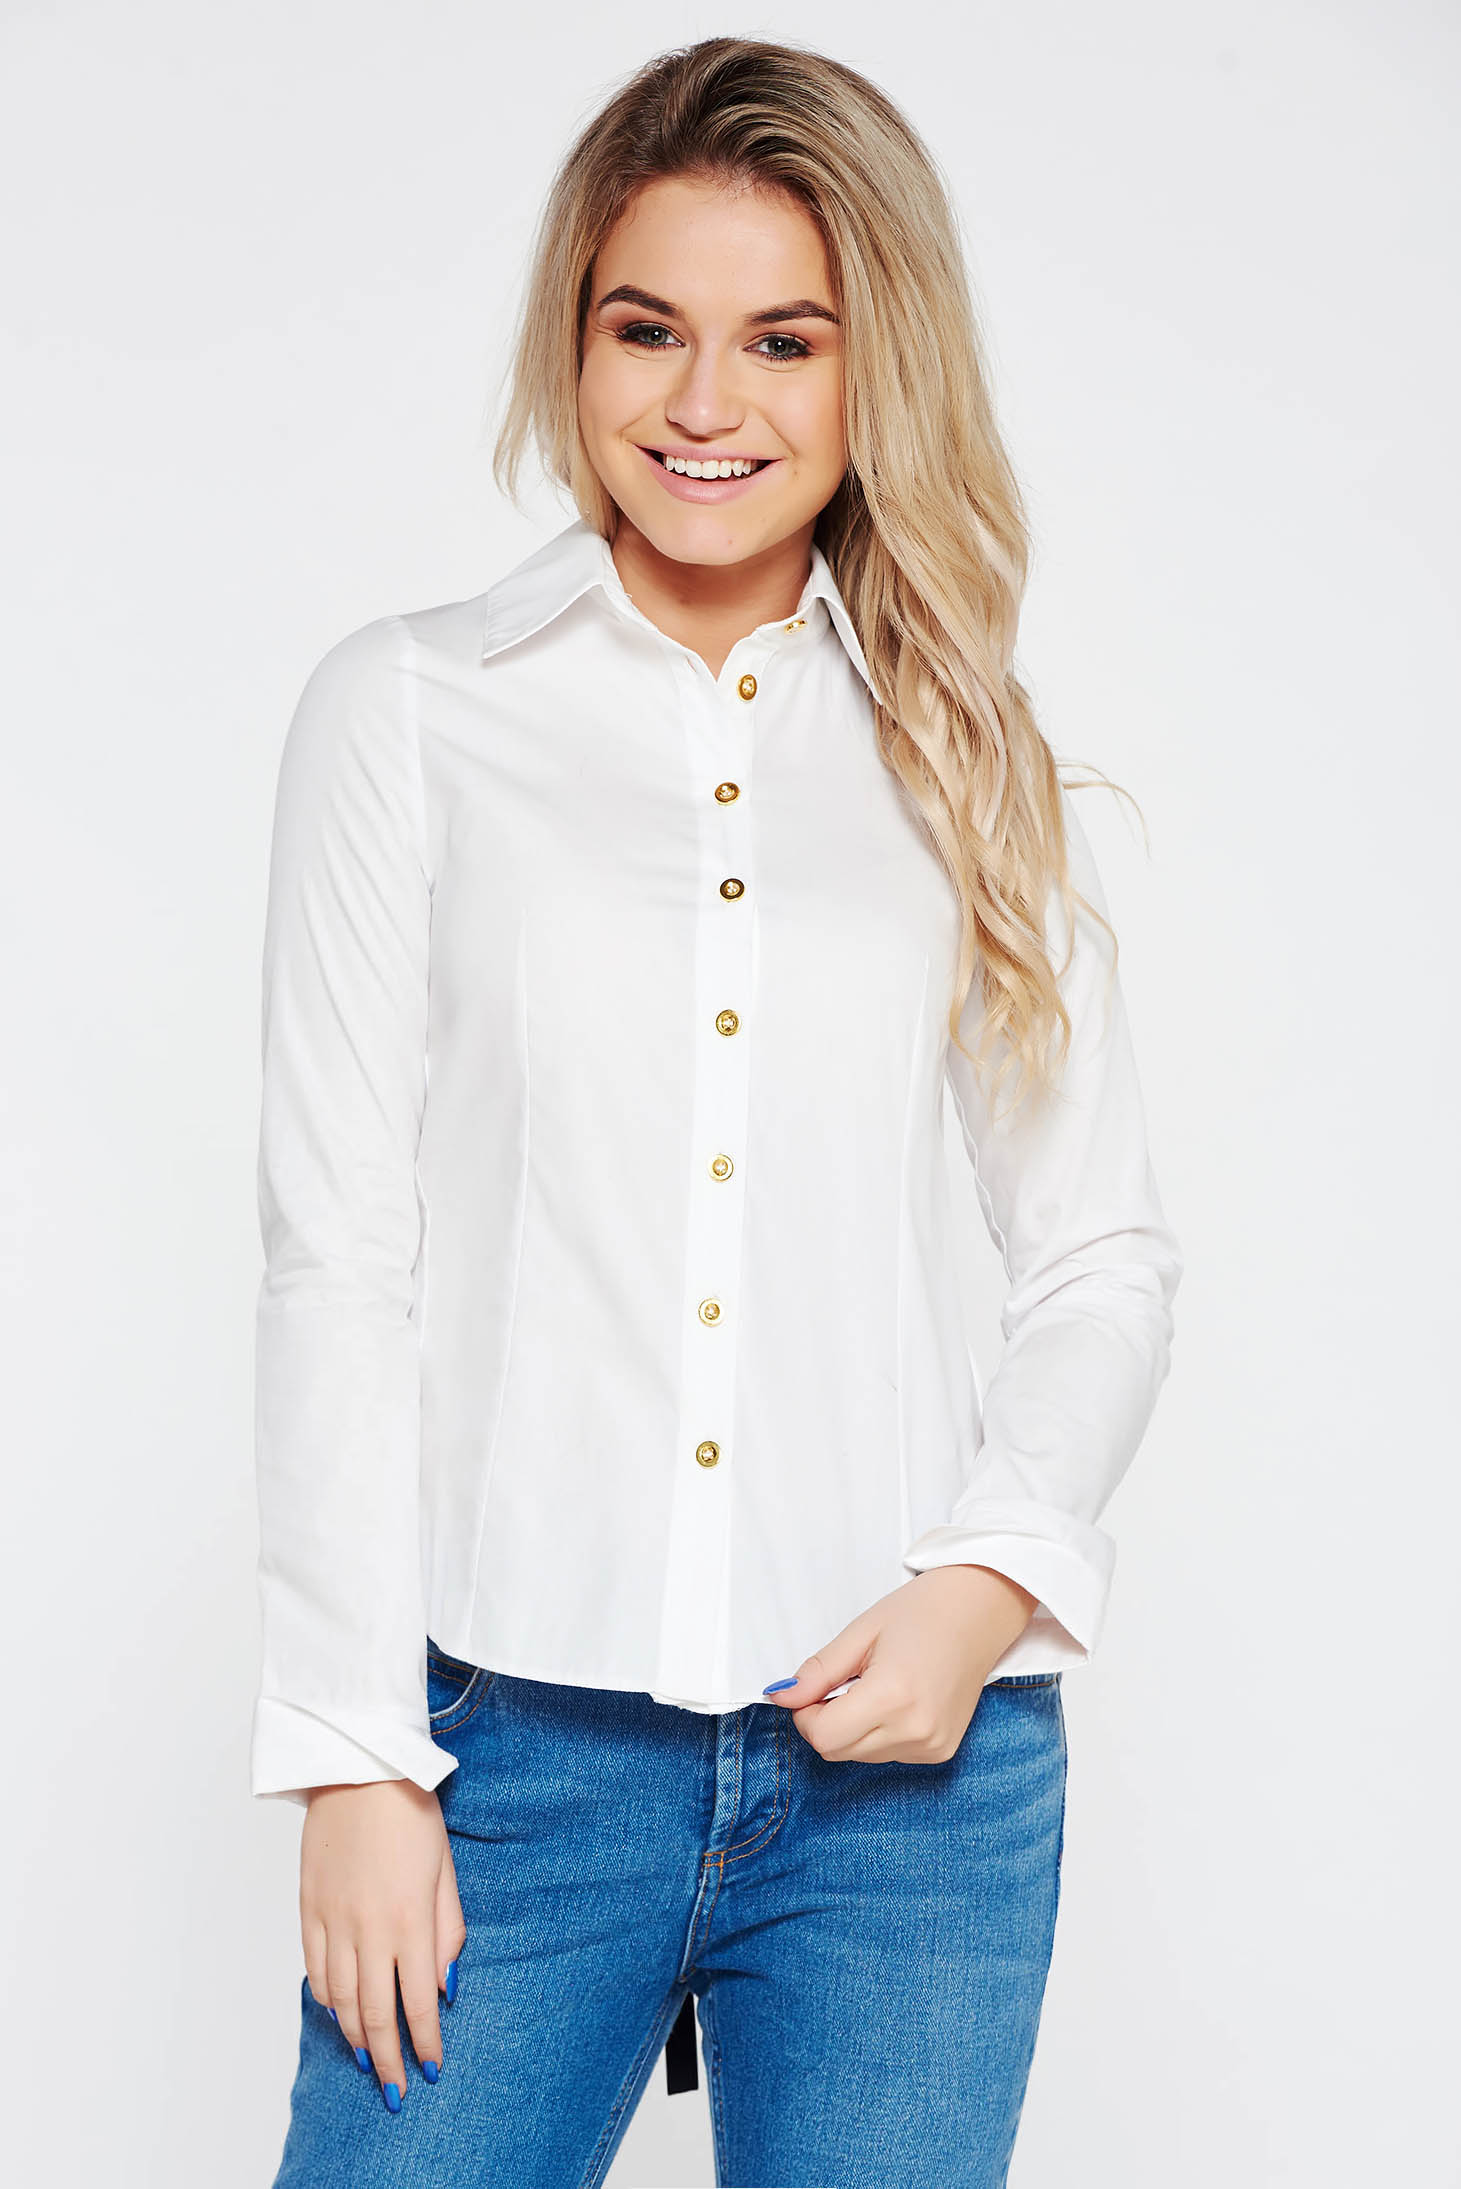 Bluza dama StarShinerS alba casual din bumbac cu spatele decupat